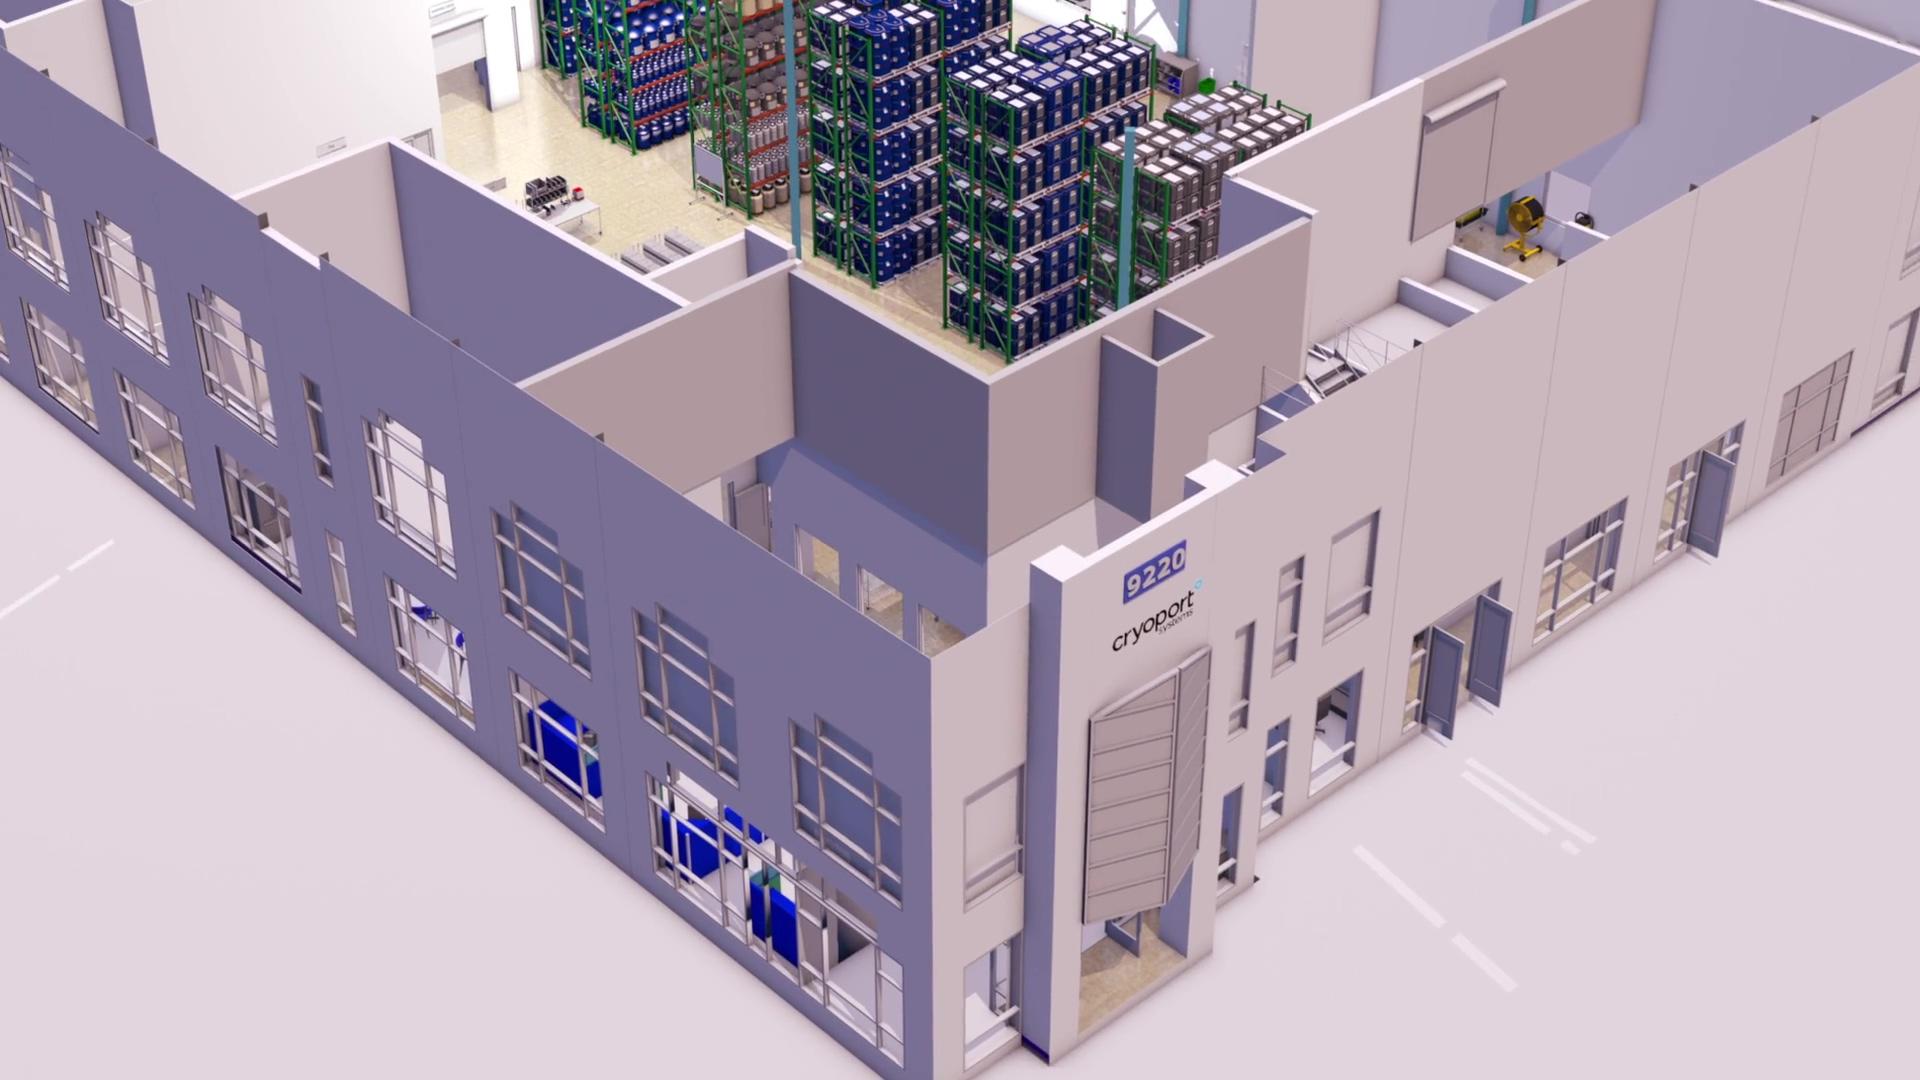 Cryoport BioServices - Houston